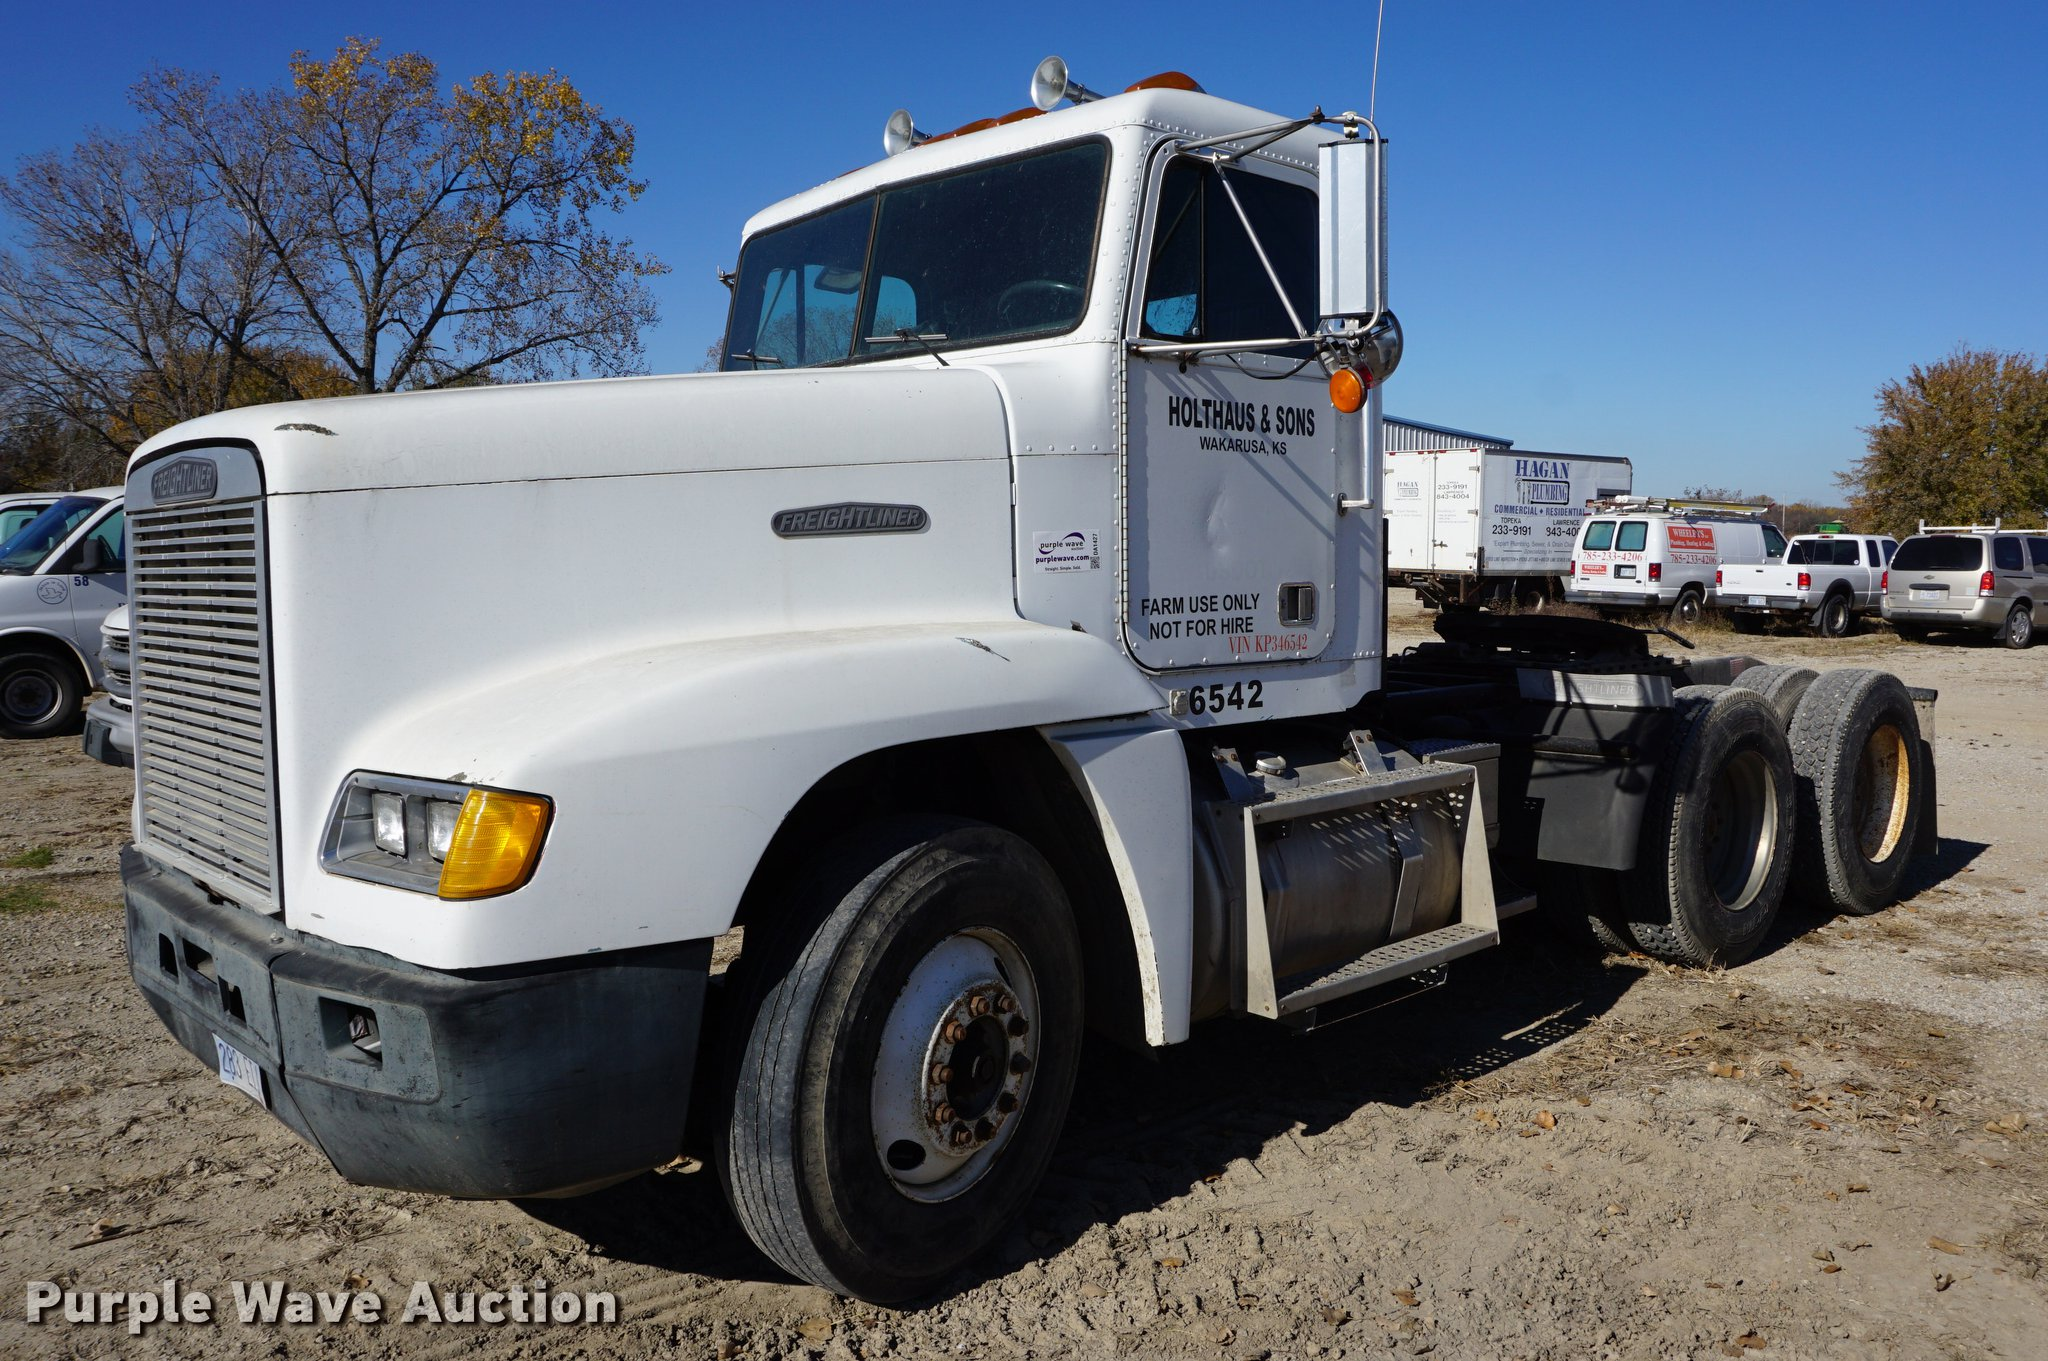 1989 Freightliner FLD semi truck | Item DA1427 | SOLD! Decem